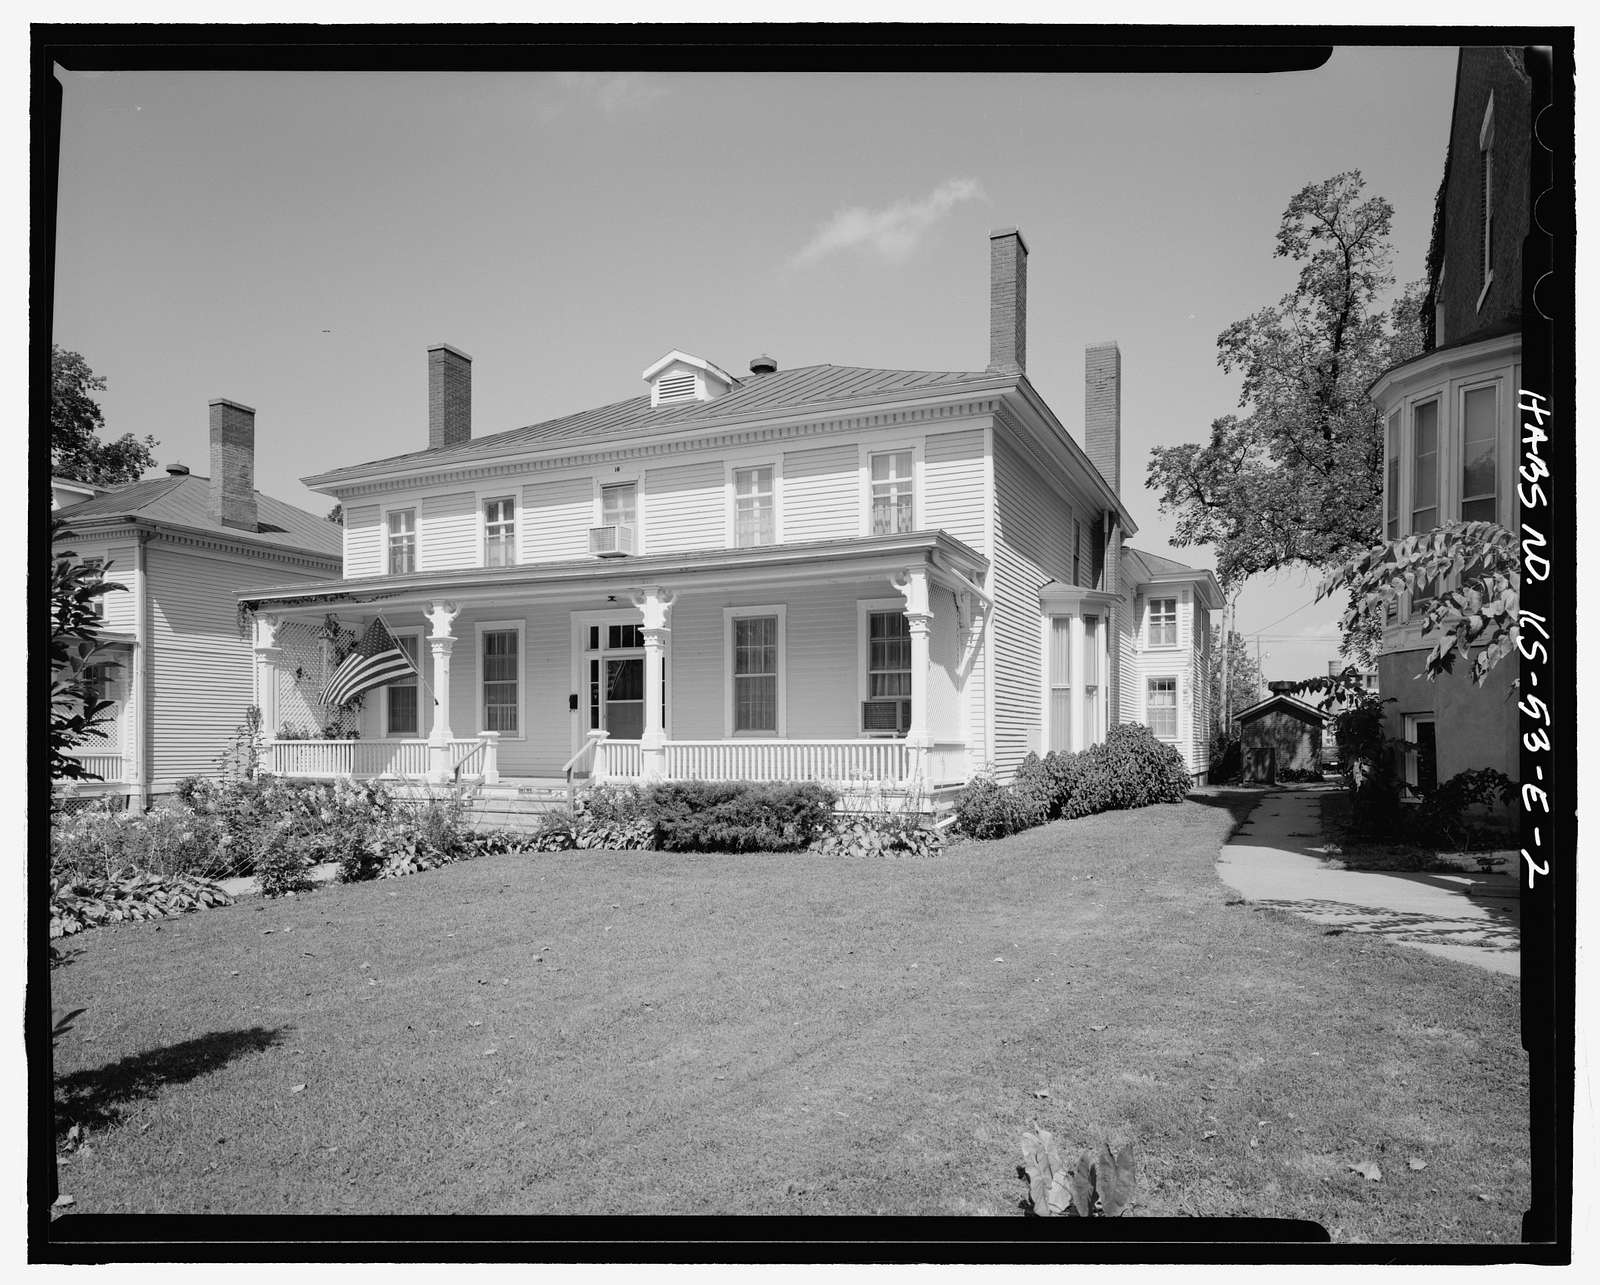 Fort Leavenworth, Building No. 16, 24 Sumner Place, Leavenworth, Leavenworth County, KS